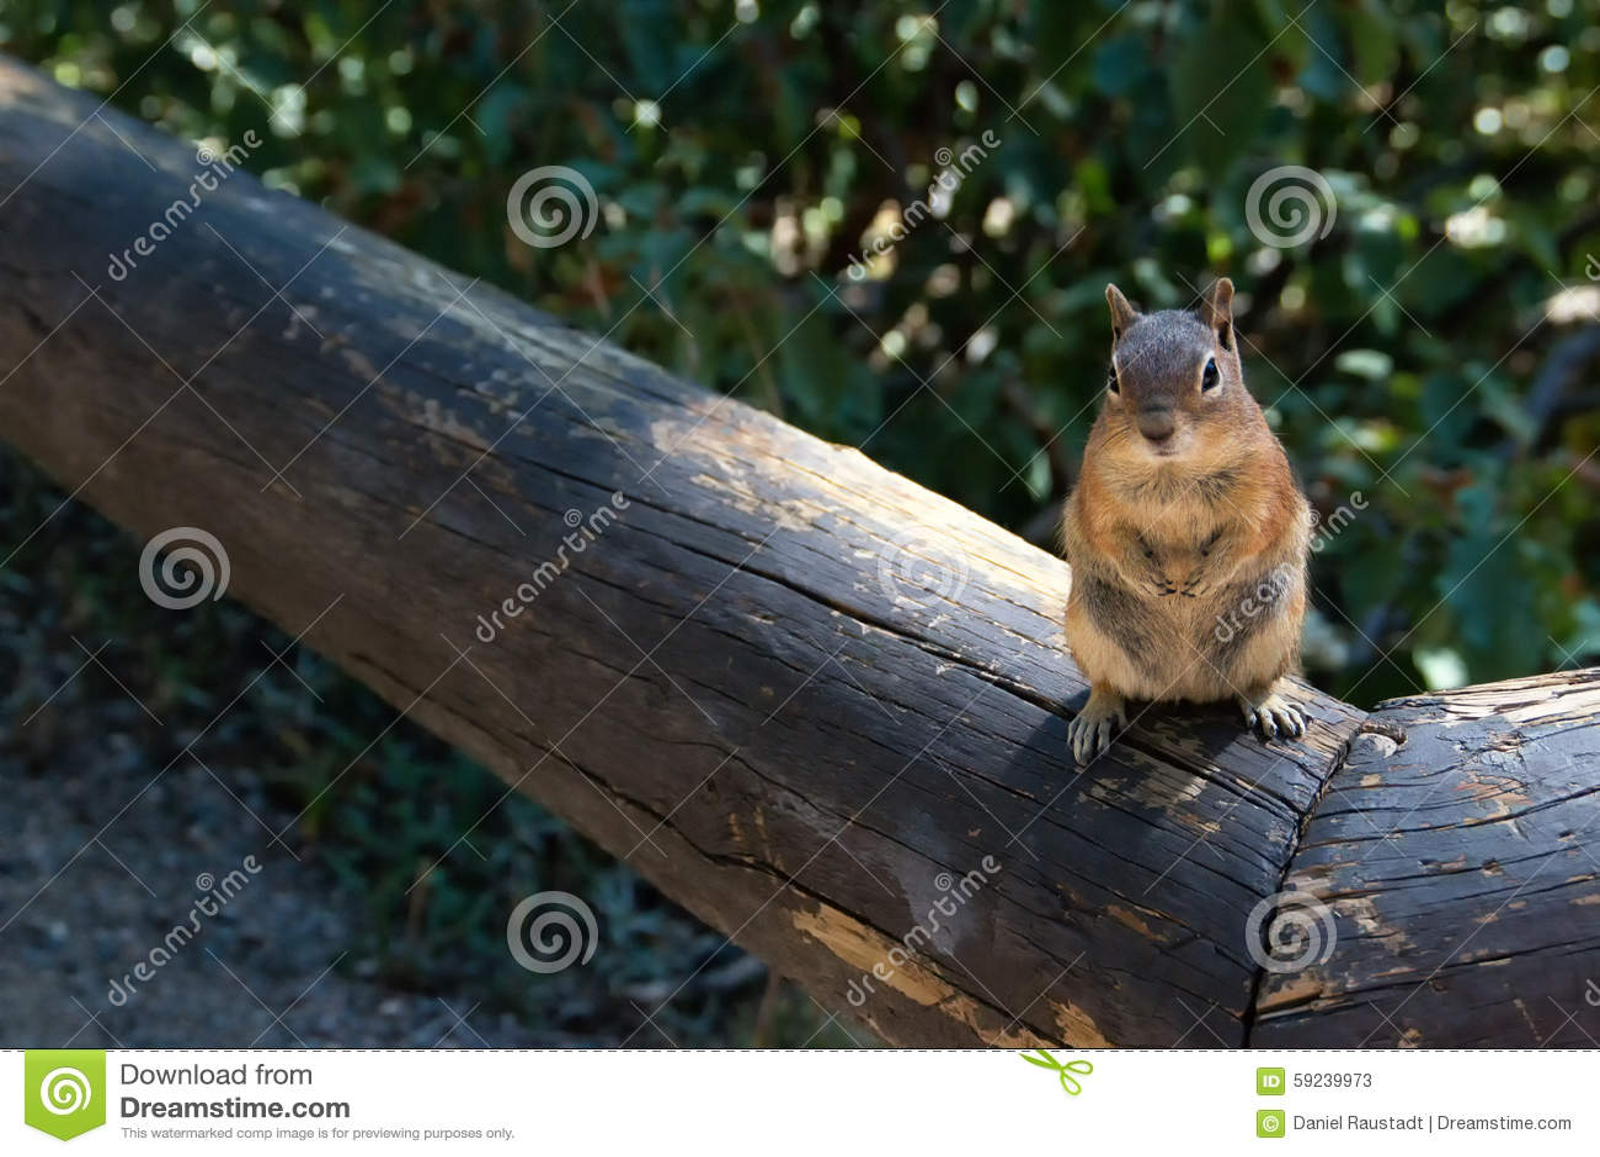 Pequeño Rocky Mountain Squirrel amistoso